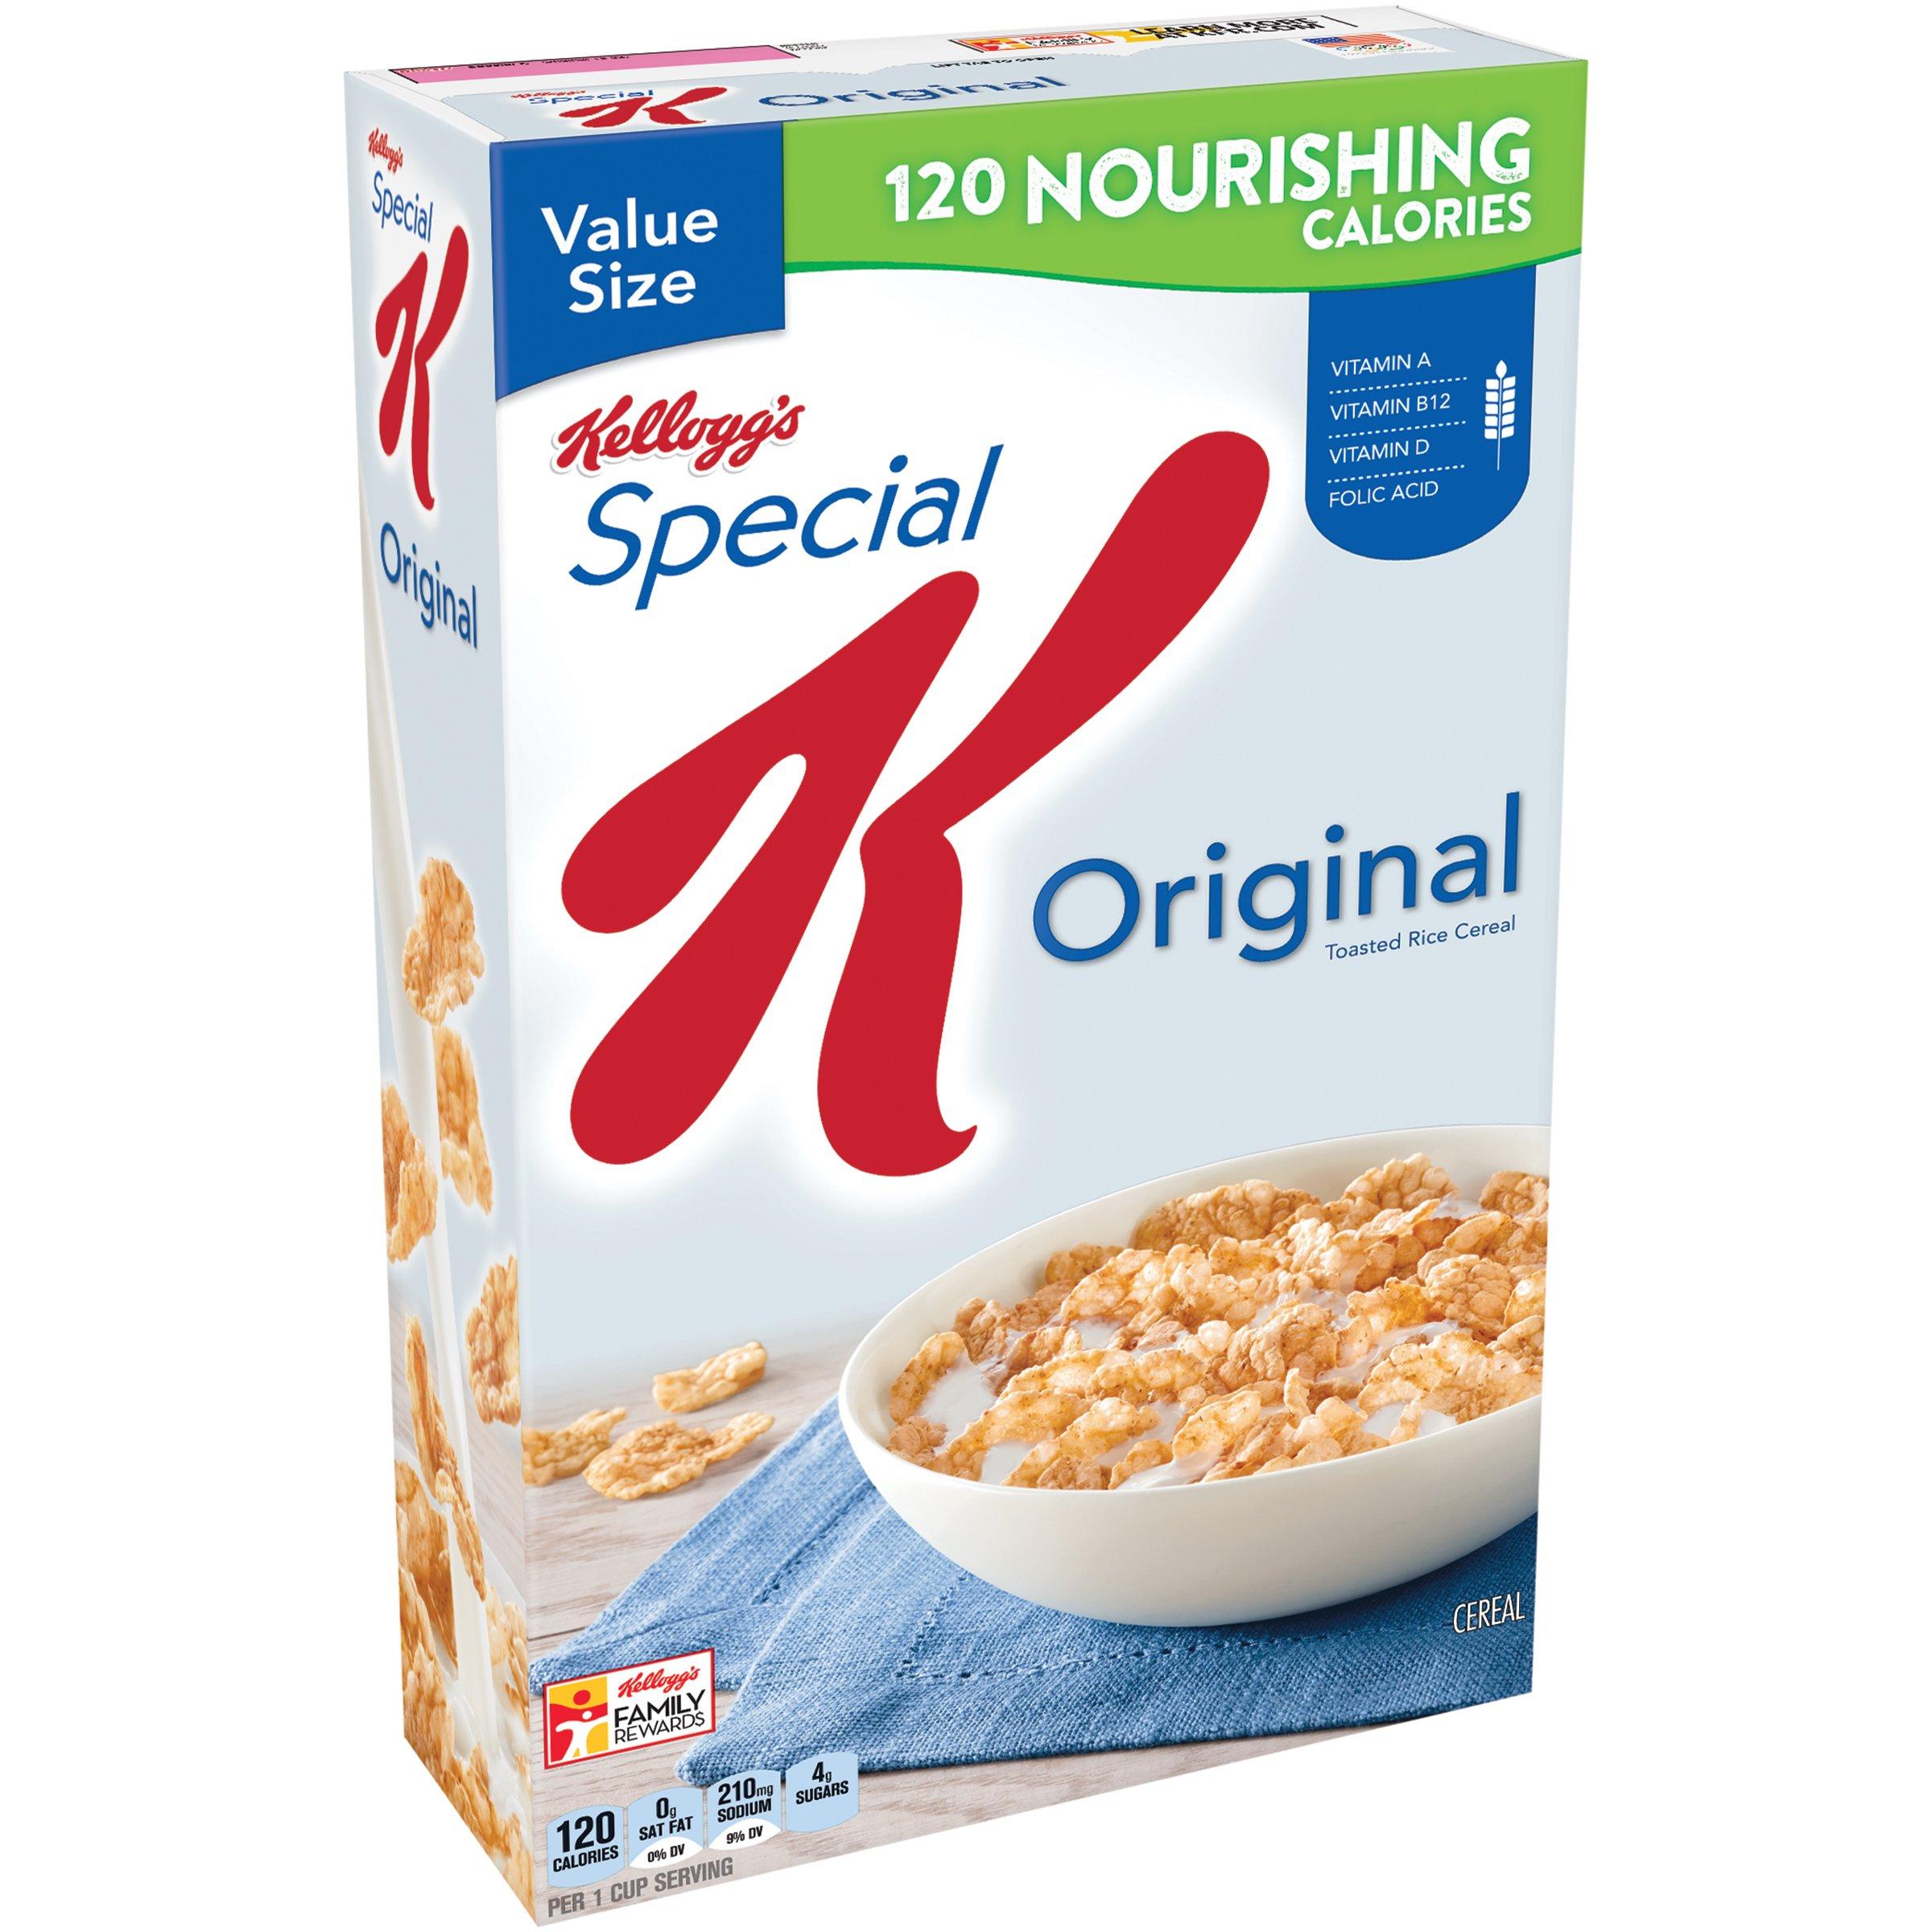 Amazon.com: Kellogg's Corn Flakes Breakfast Cereal